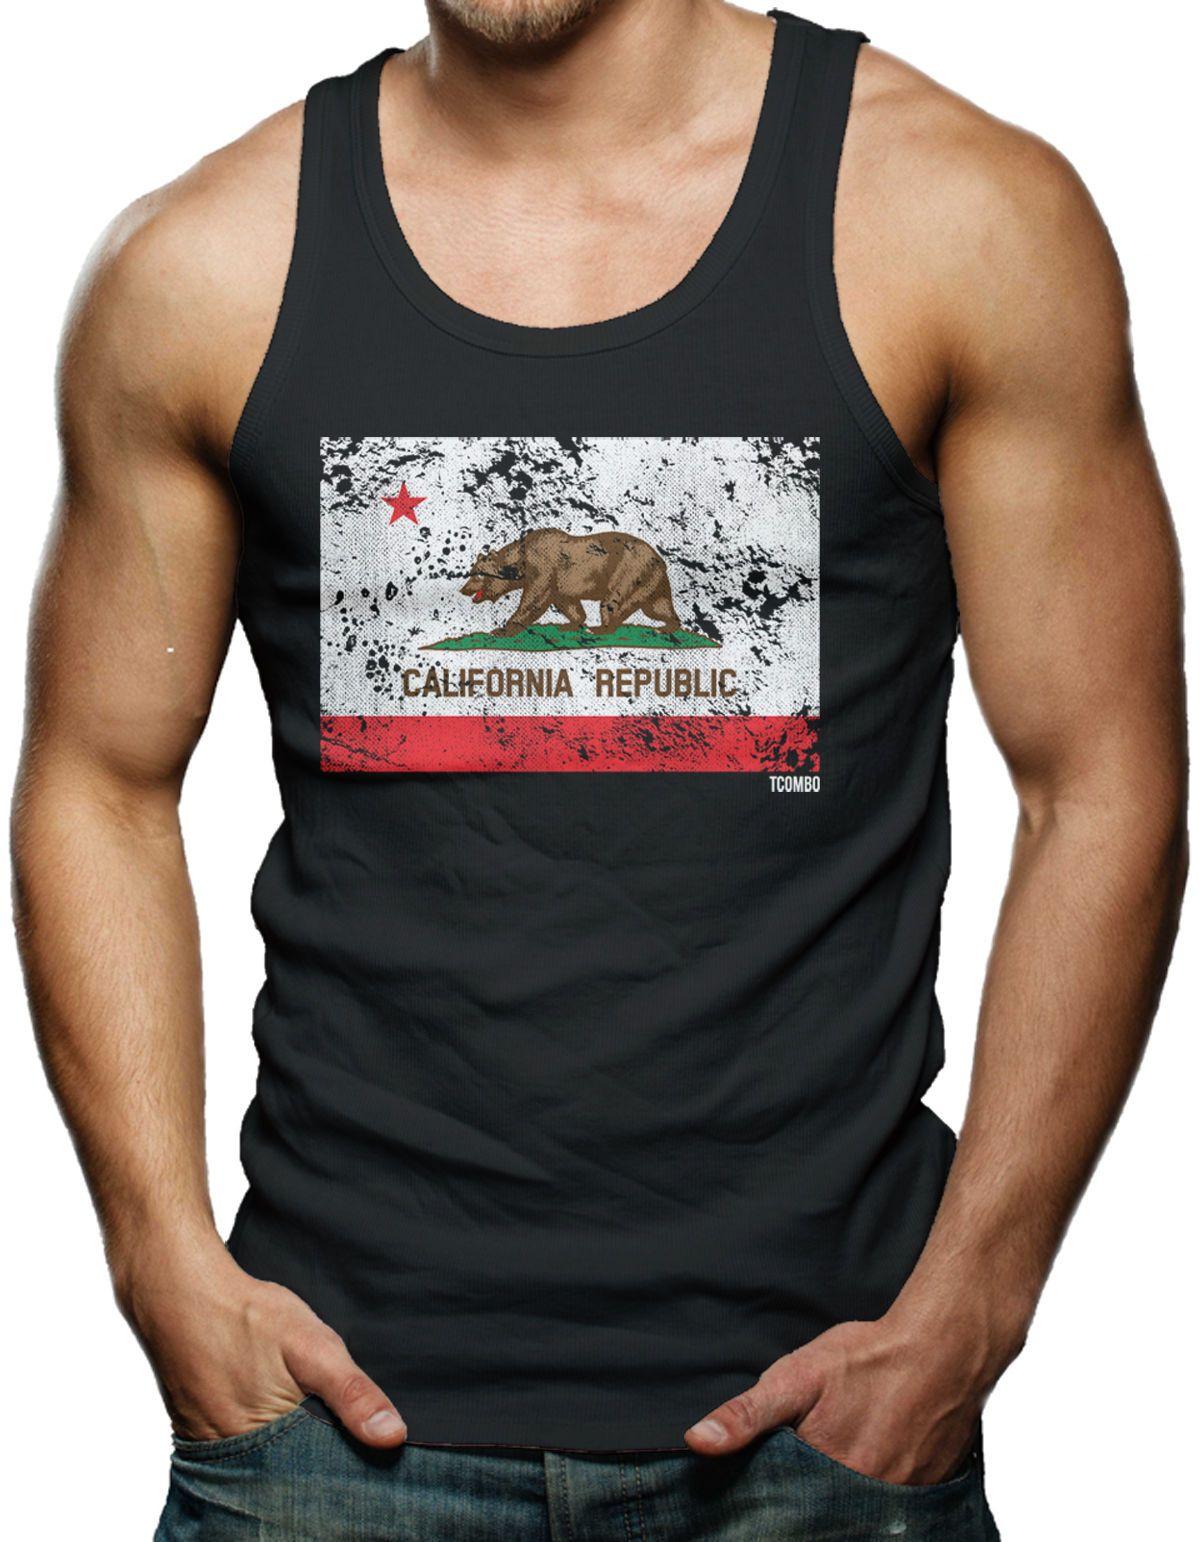 Cali Bear Pride Distressed Men/'s Tank Top T-shirt California Republic Flag